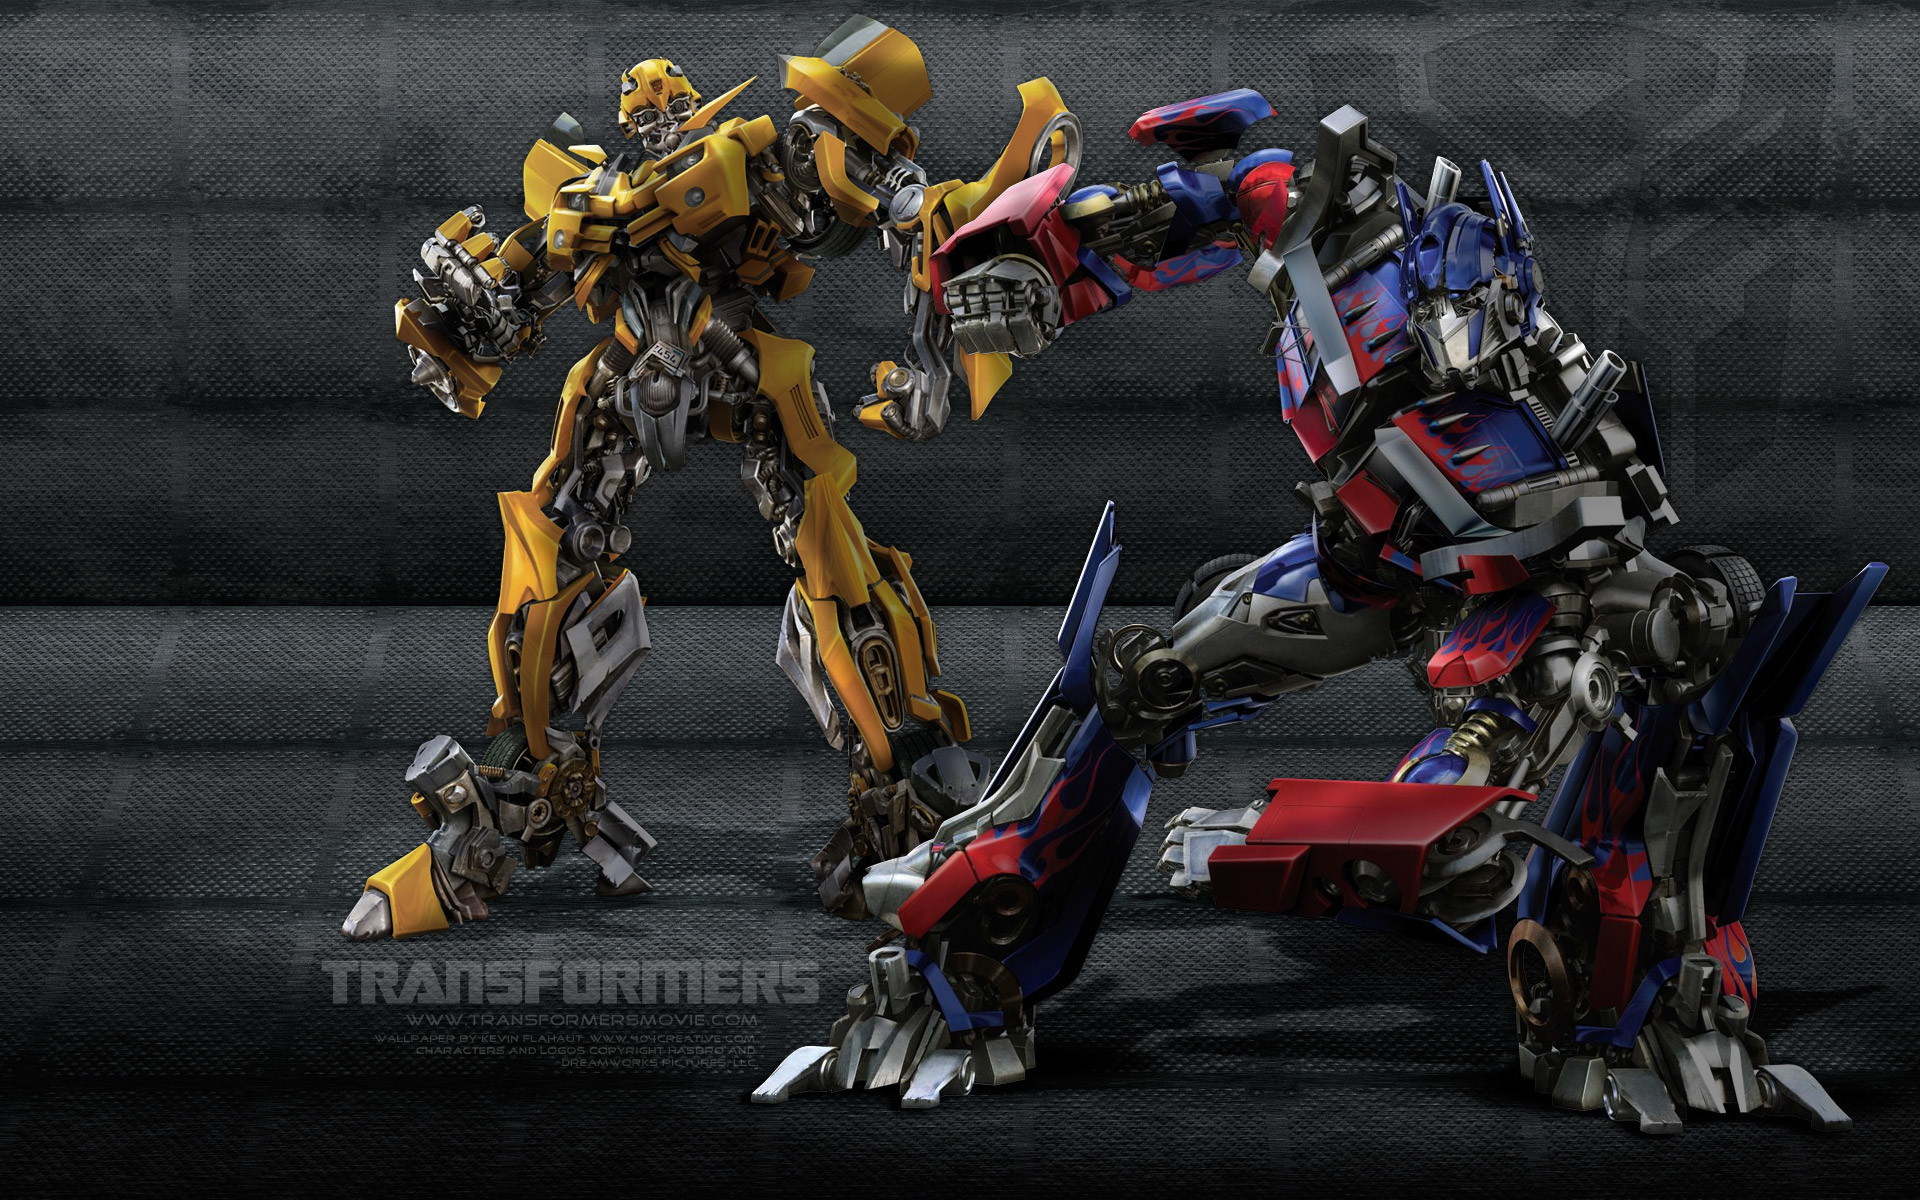 transformers hd wallpaper. More Transformers Wallpapers. We …